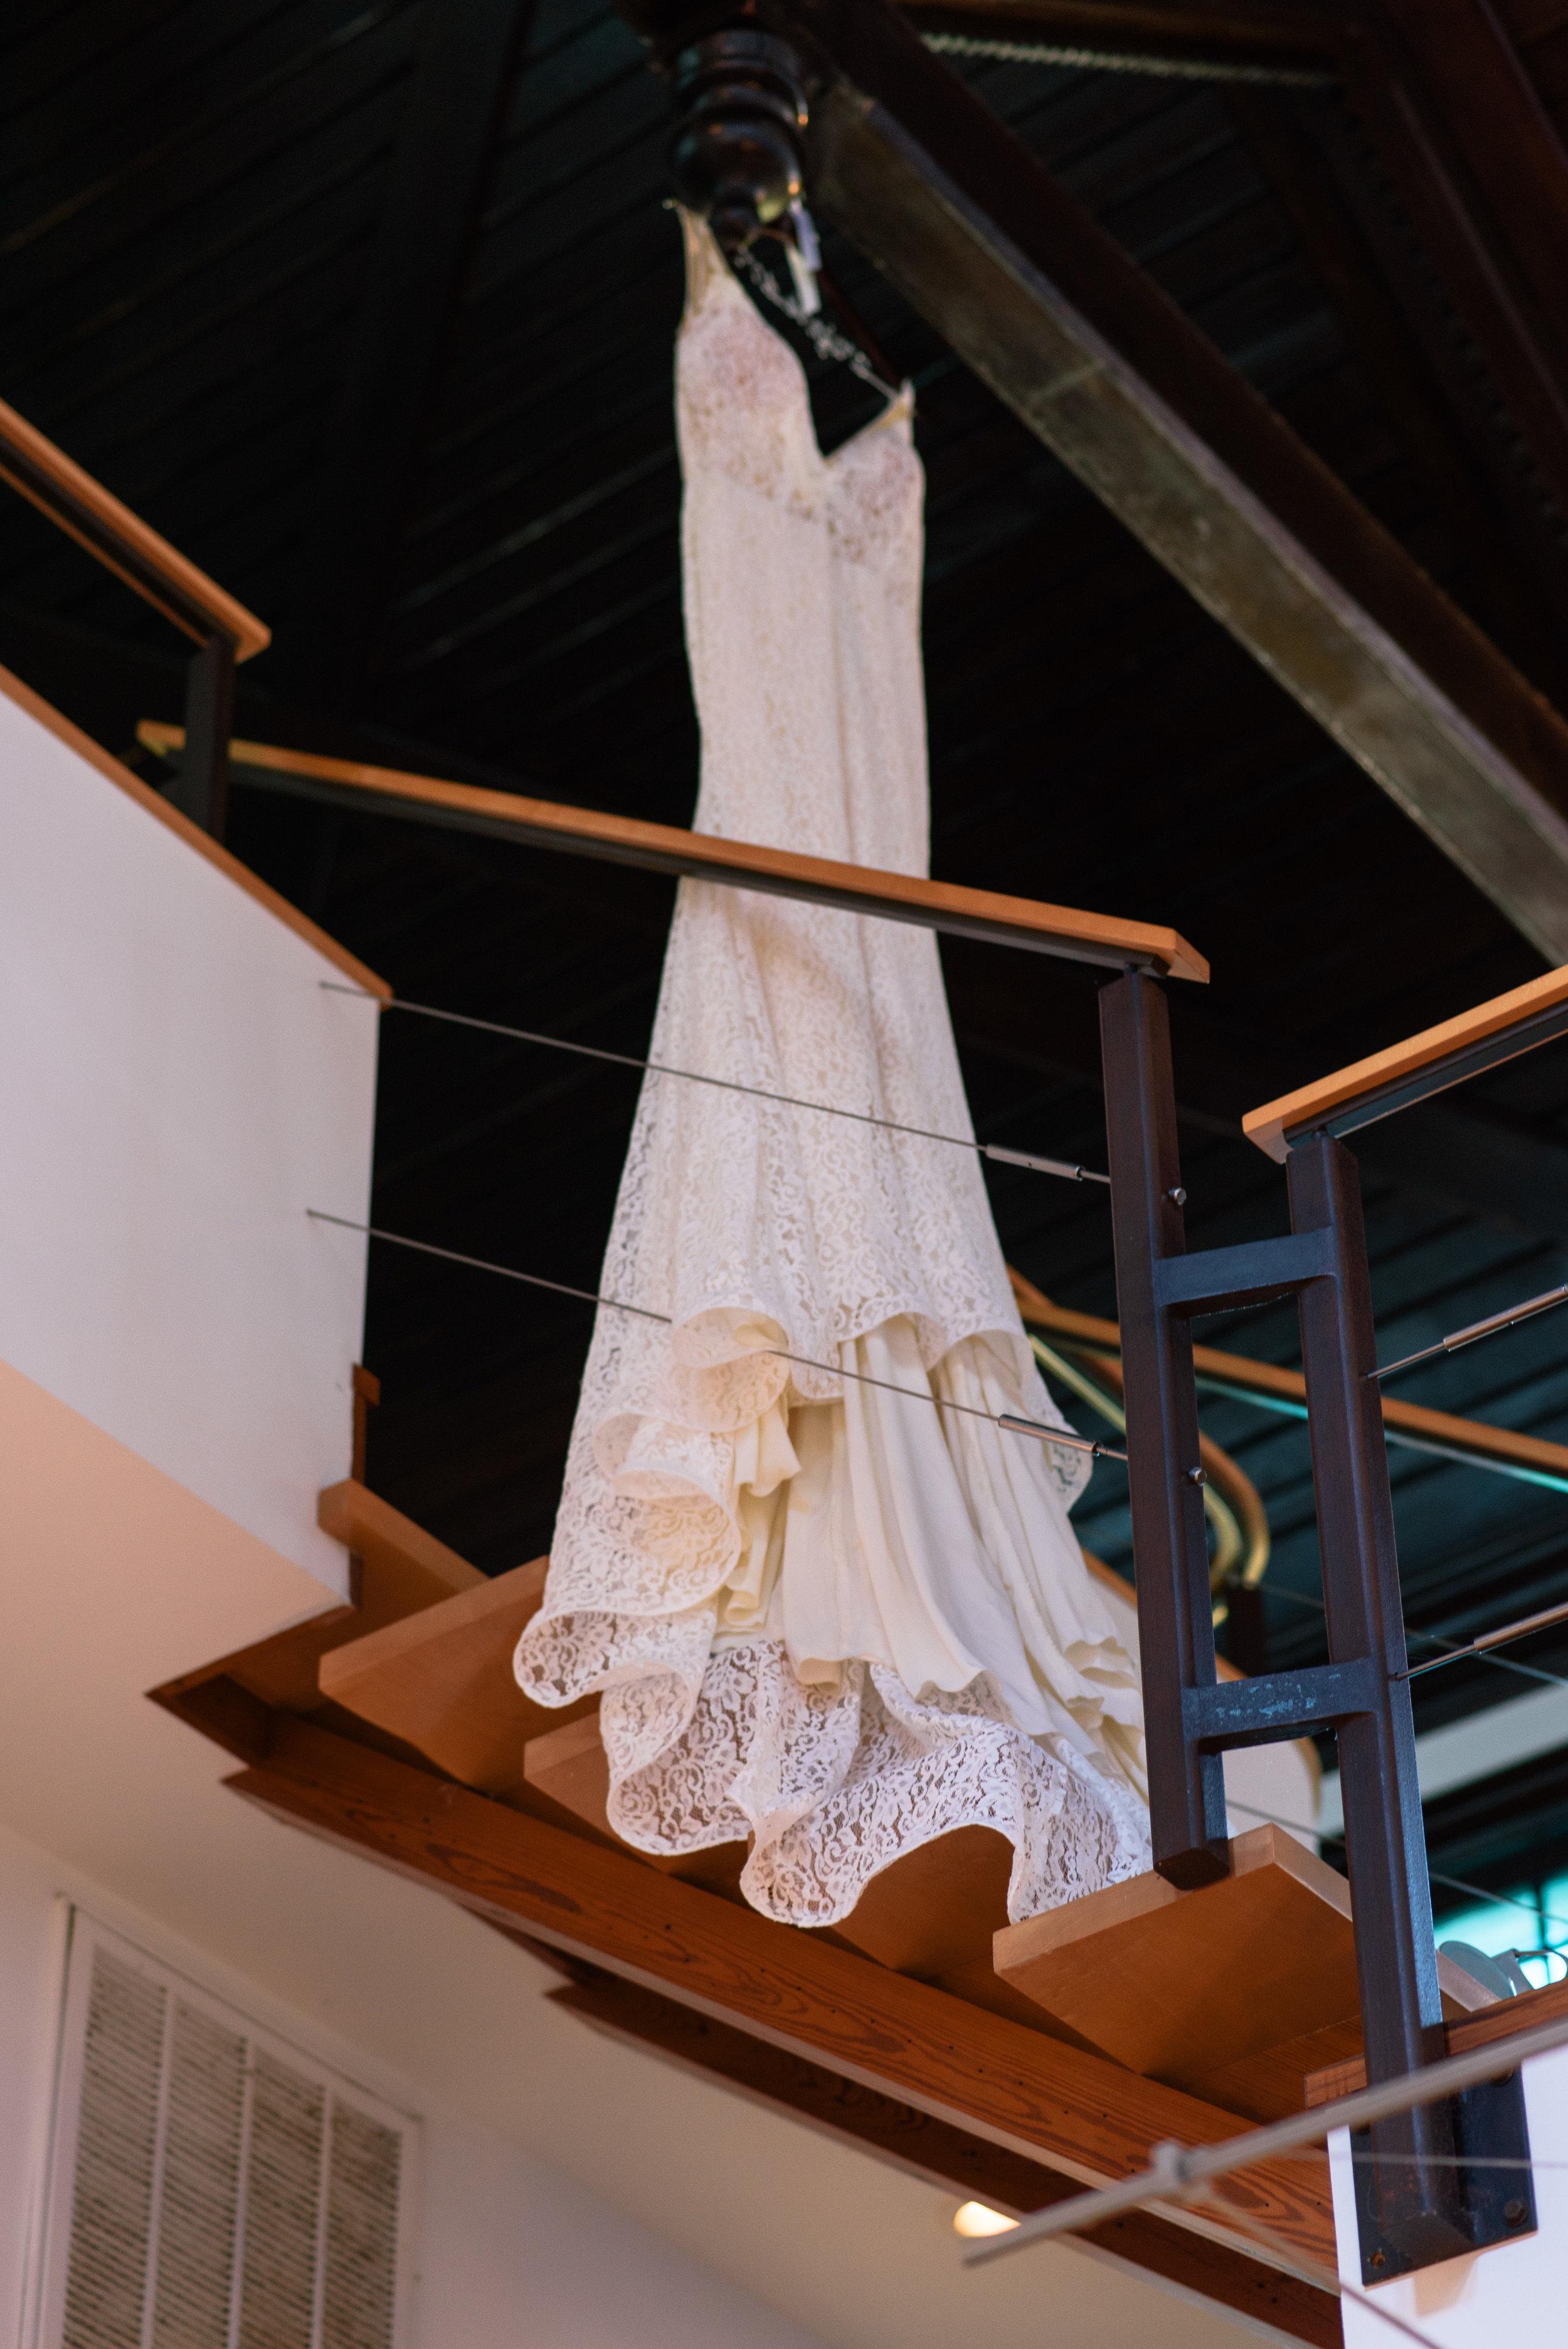 Iggy-and-yesenia-savannah-railroad-museum-wedding-meg-hill-photo- (116 of 1037).jpg